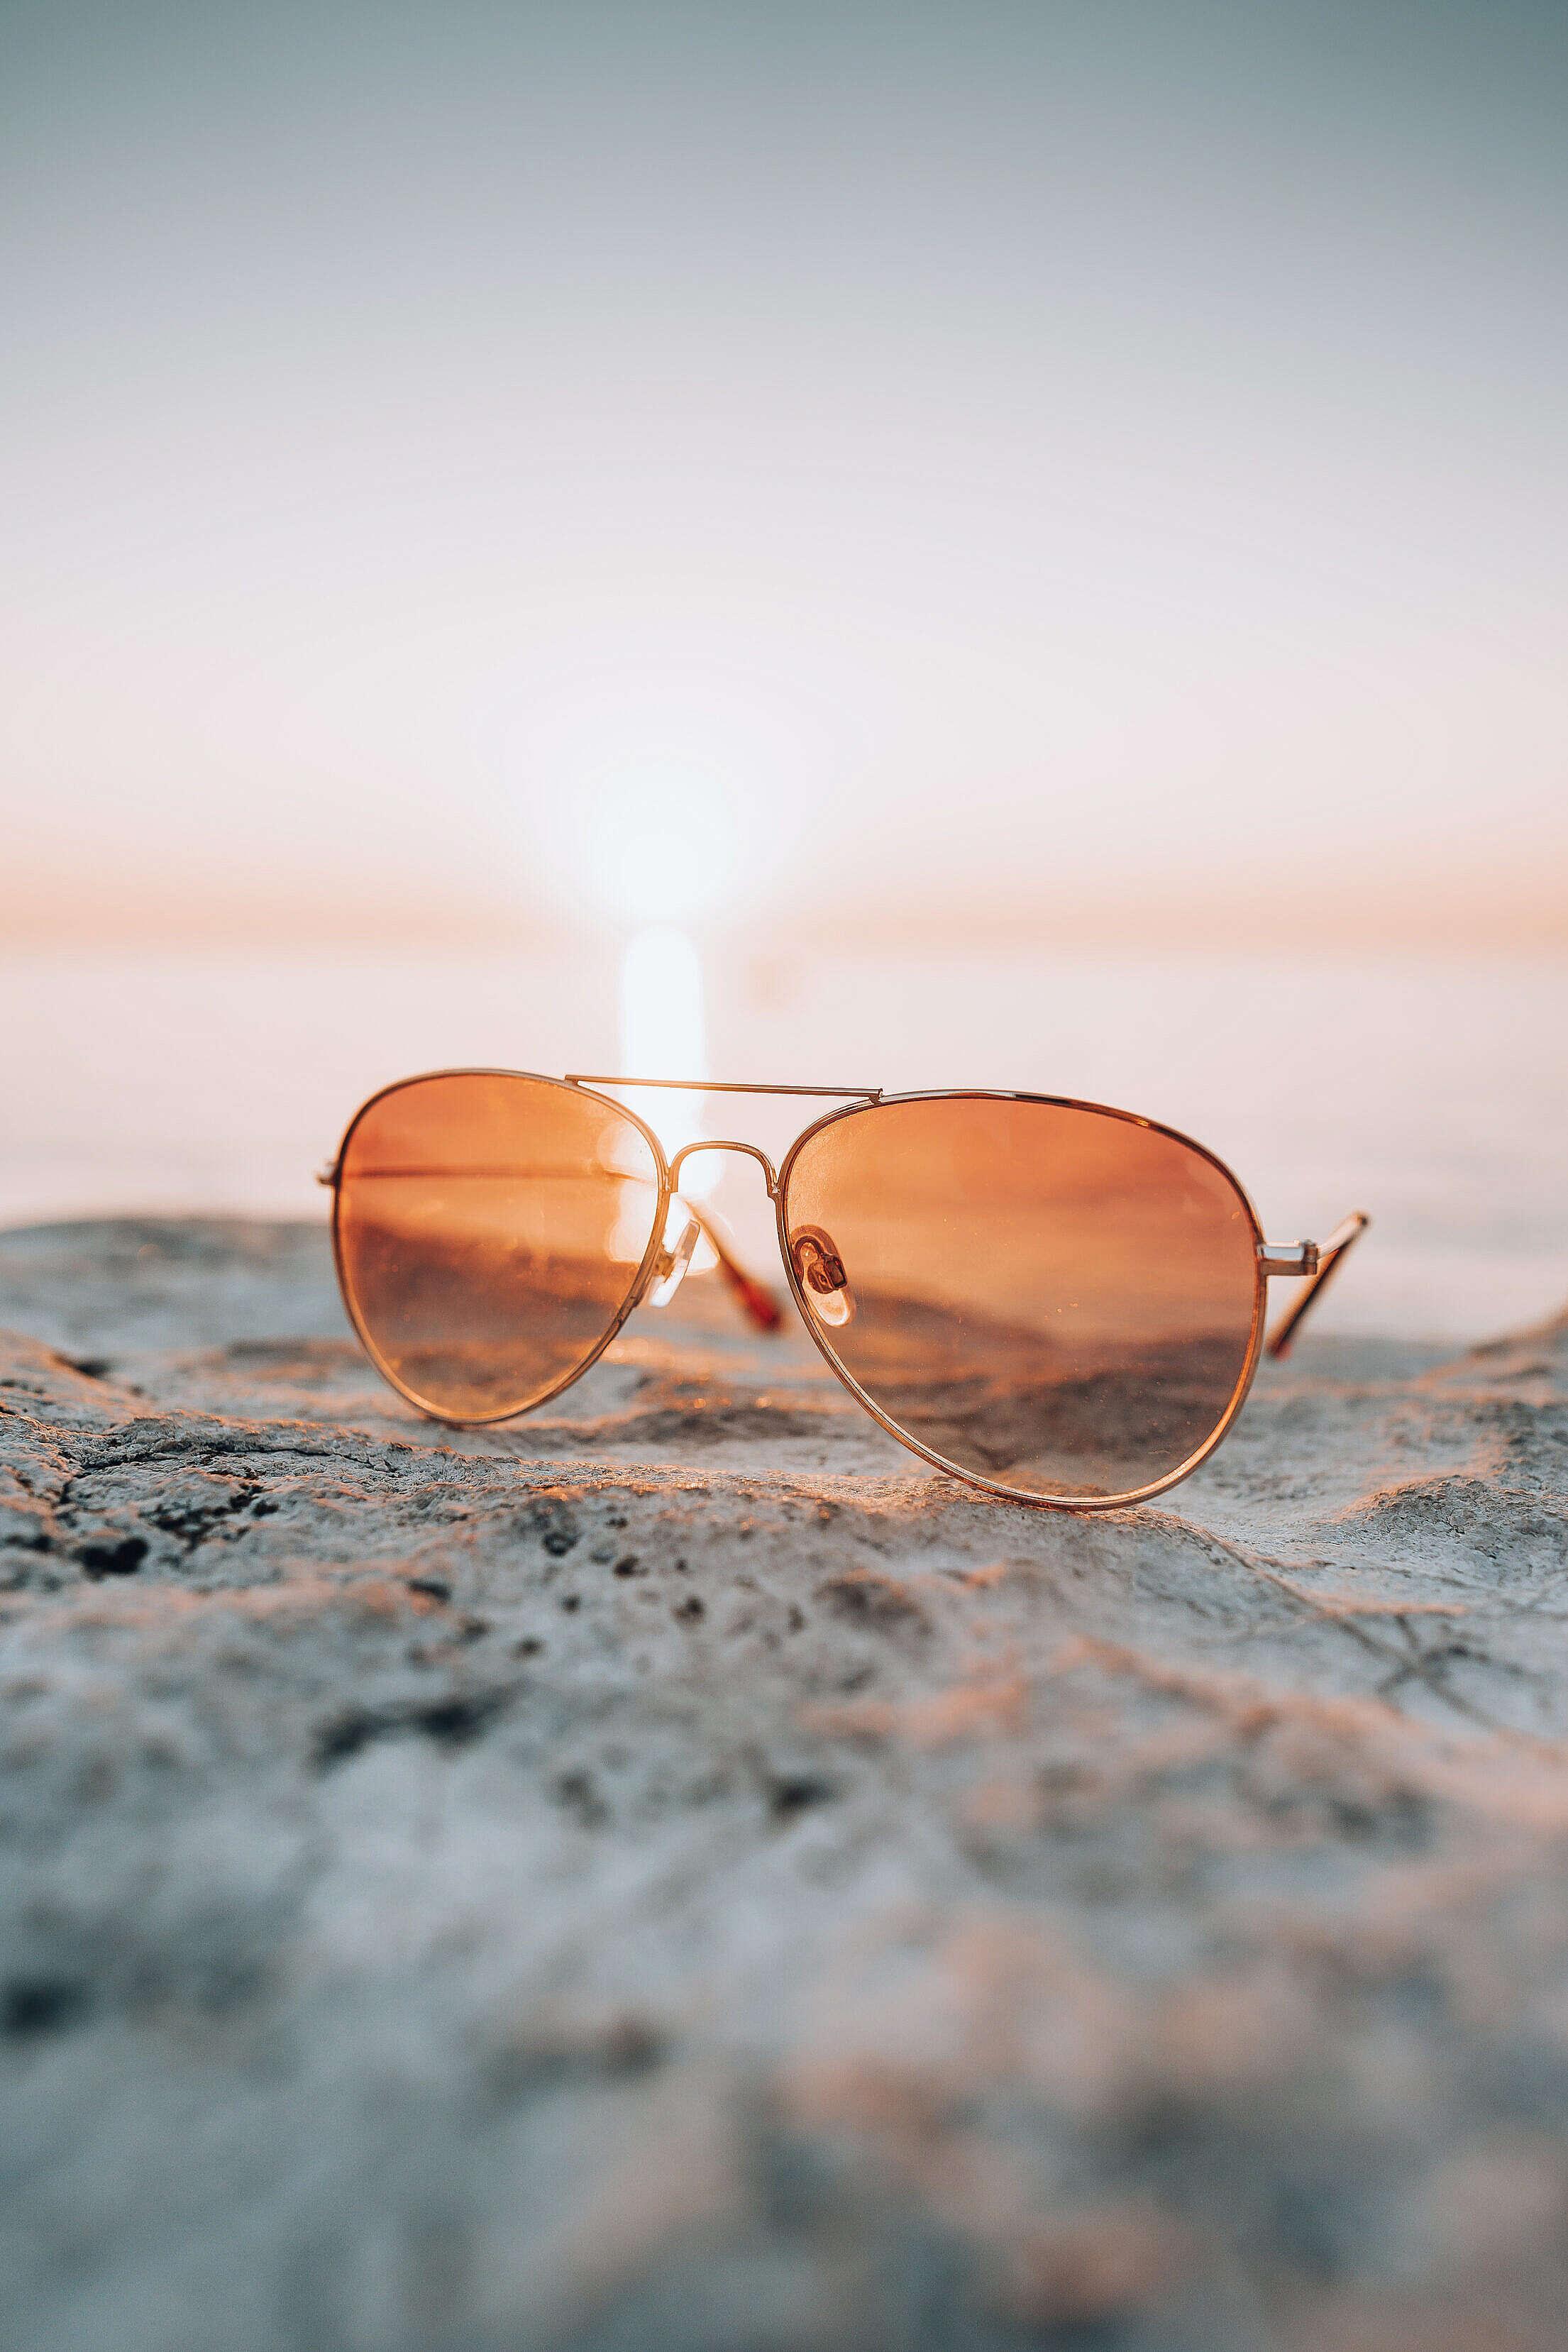 Fashion Sunglasses Sea Sunset and Stone Free Stock Photo